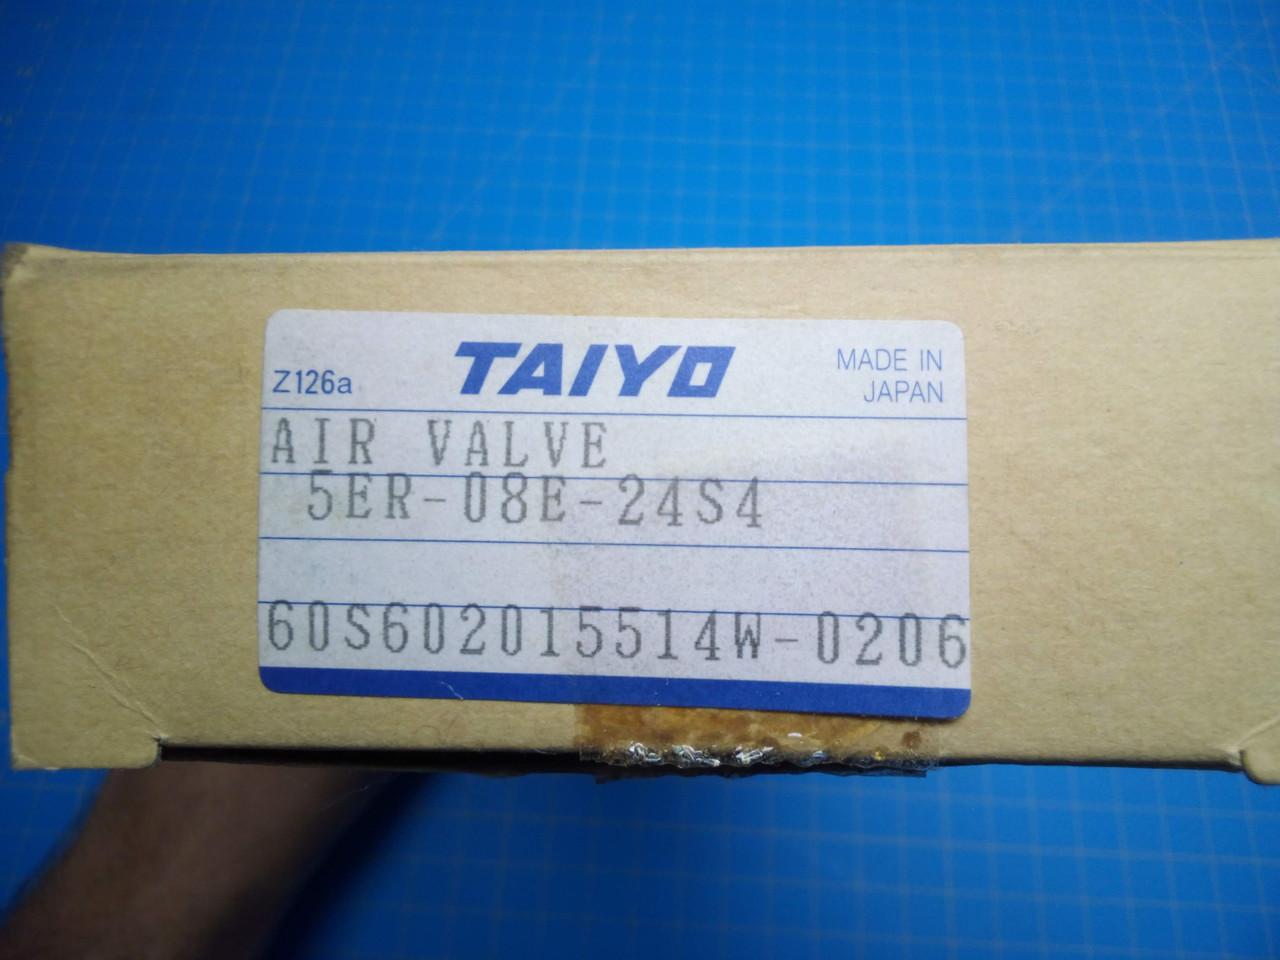 Taiyo / Parker 5ER-08E-24S4 Air Value  - P02-000072